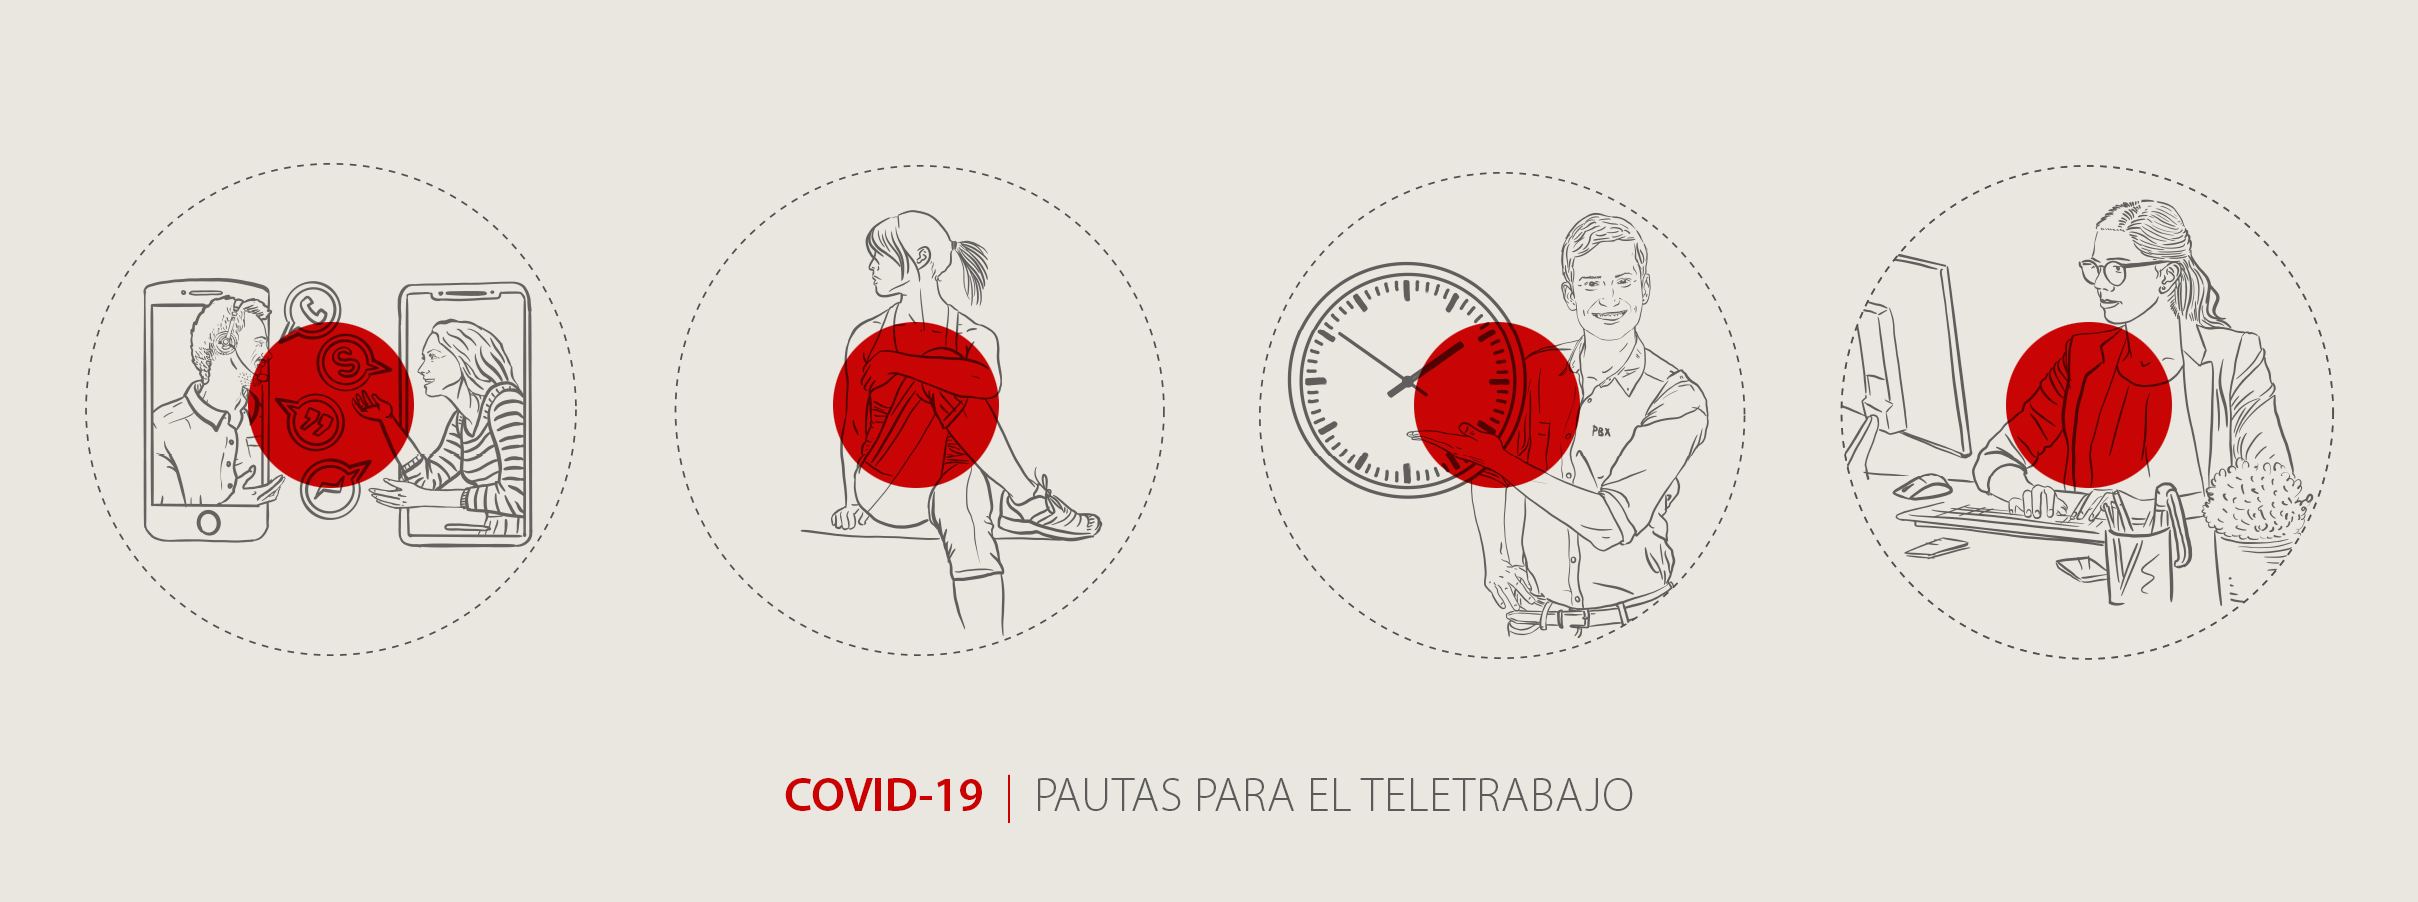 Teletrabajo - pautas teletrabajo - teletrabajo palibex - transporte urgente